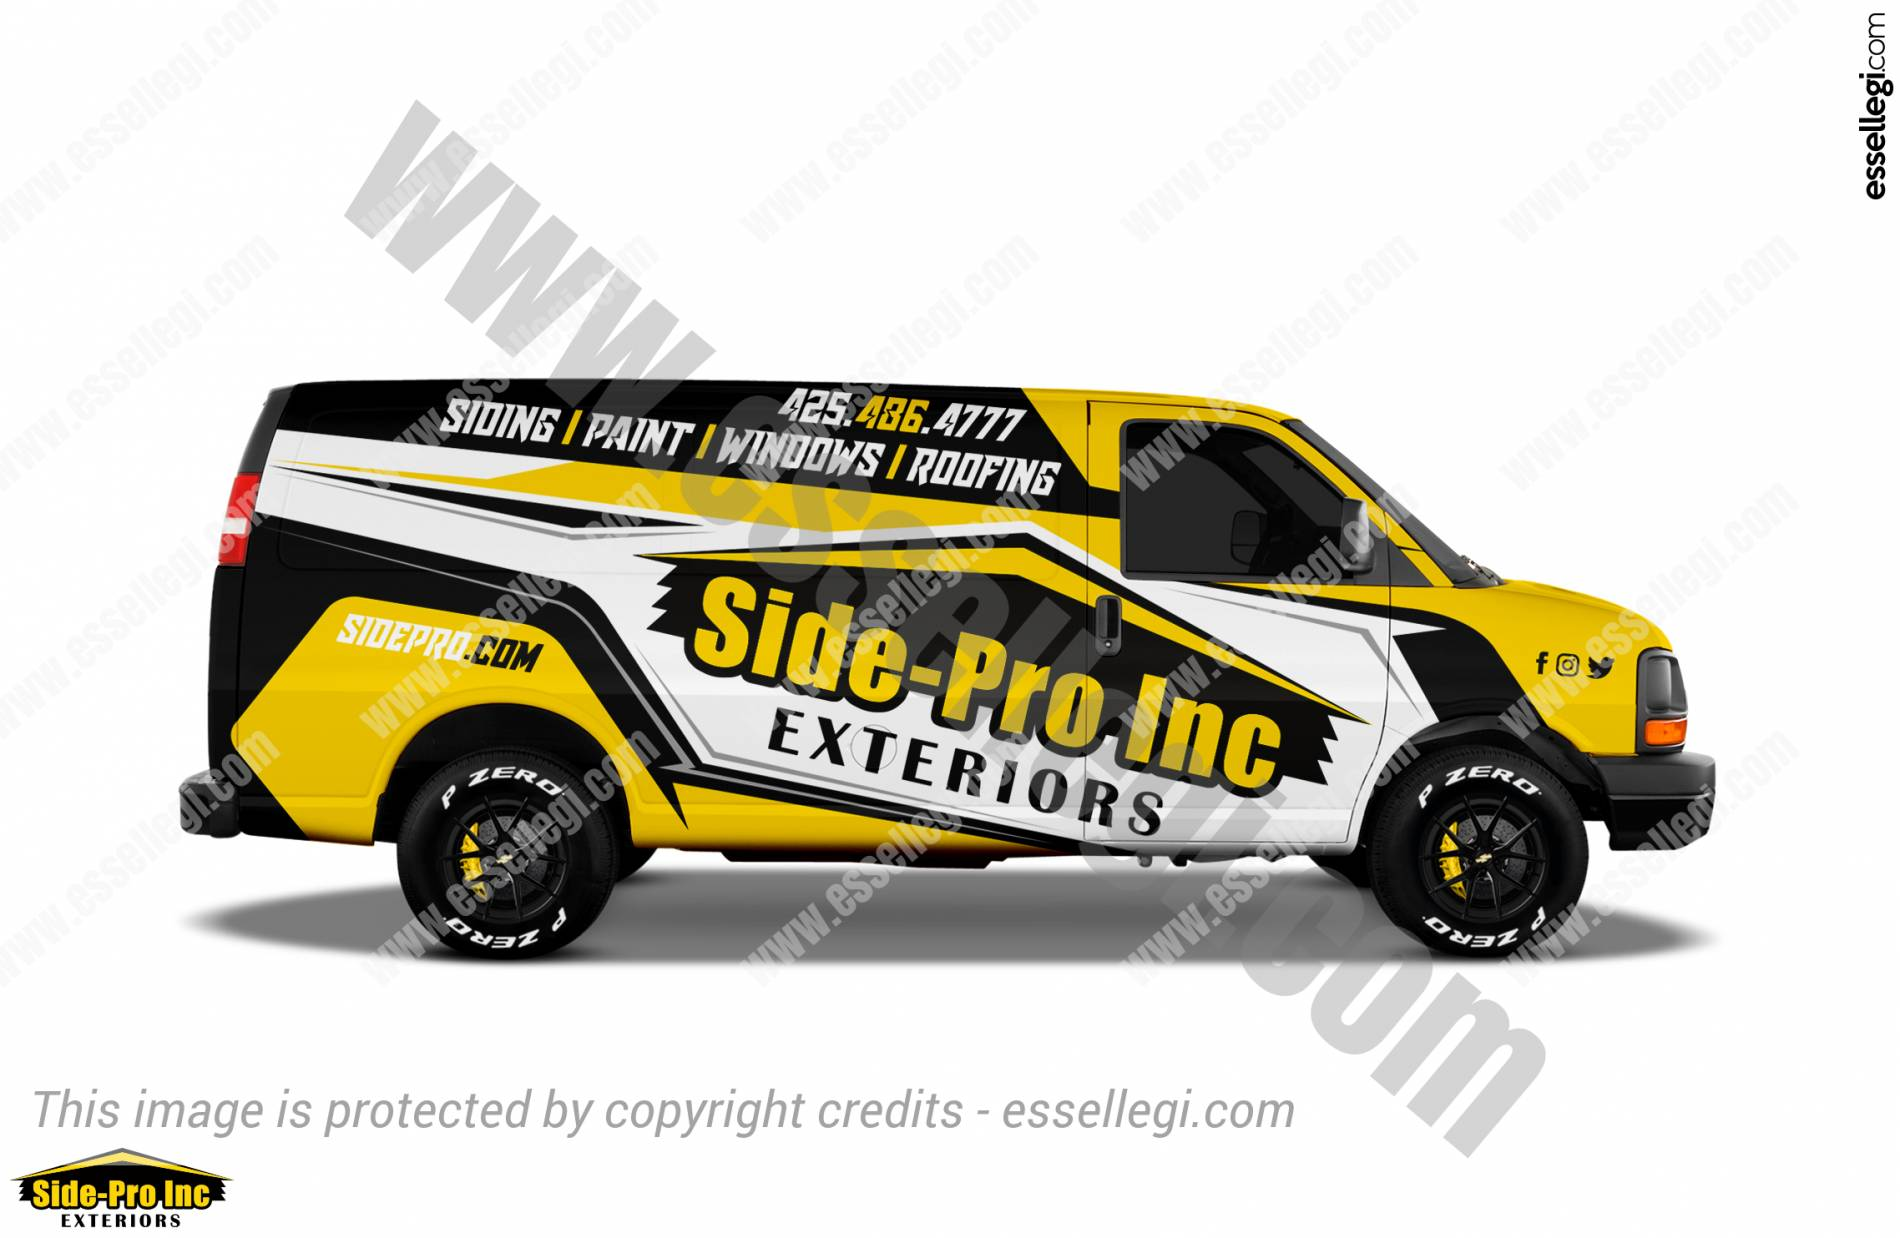 Chevy Express Wrap Design. Chevy Express | Van Wrap Design by Essellegi. Van Signs, Van Signage, Van Wrapping, Van Signwriting, Van Wrap Designer, Signs for Van, Van Logo, Van Graphic by Essellegi.